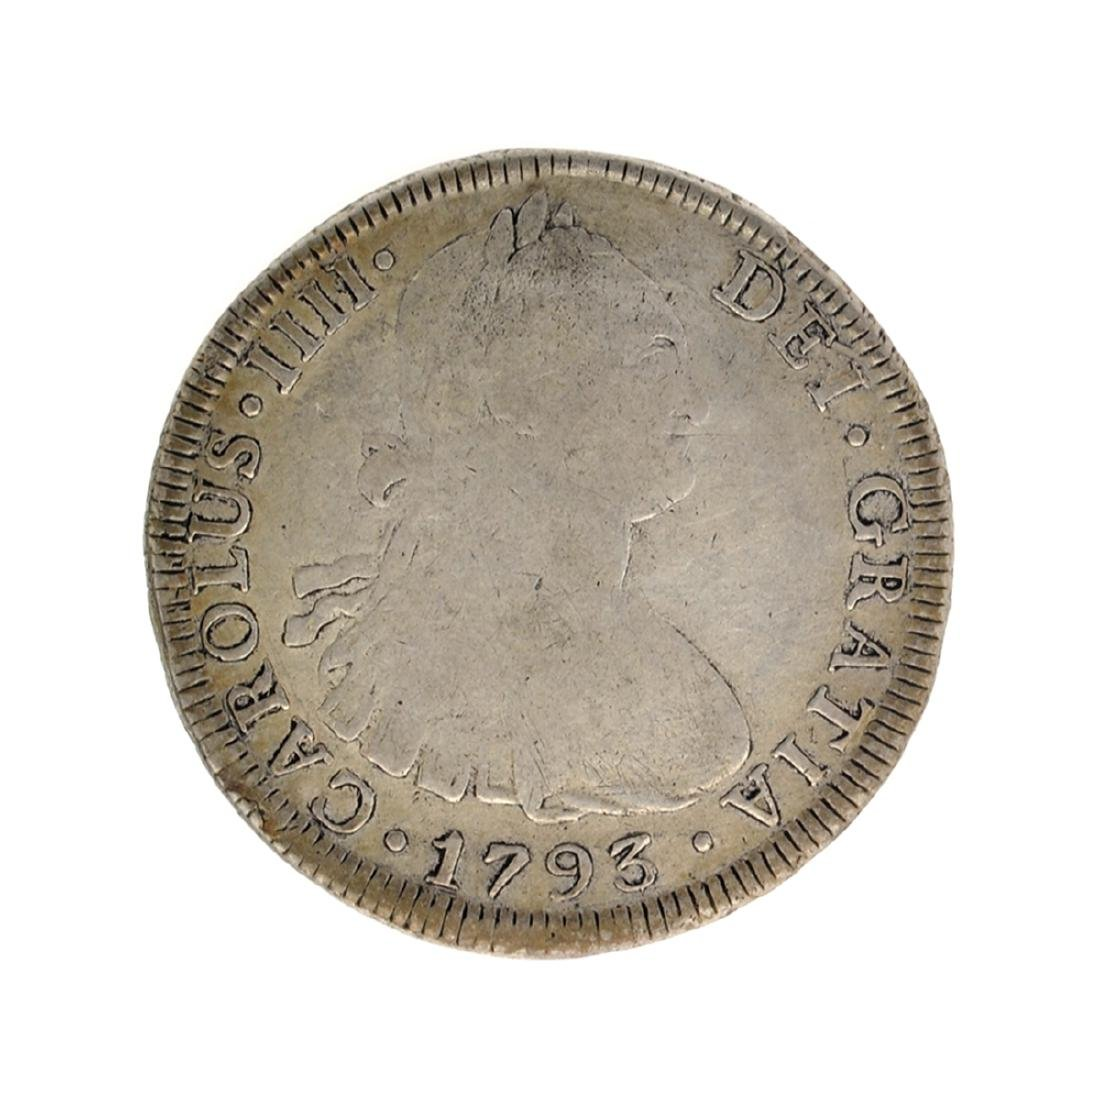 1793 Spanish Colonial 8 Reales Carolus IIII Pillar